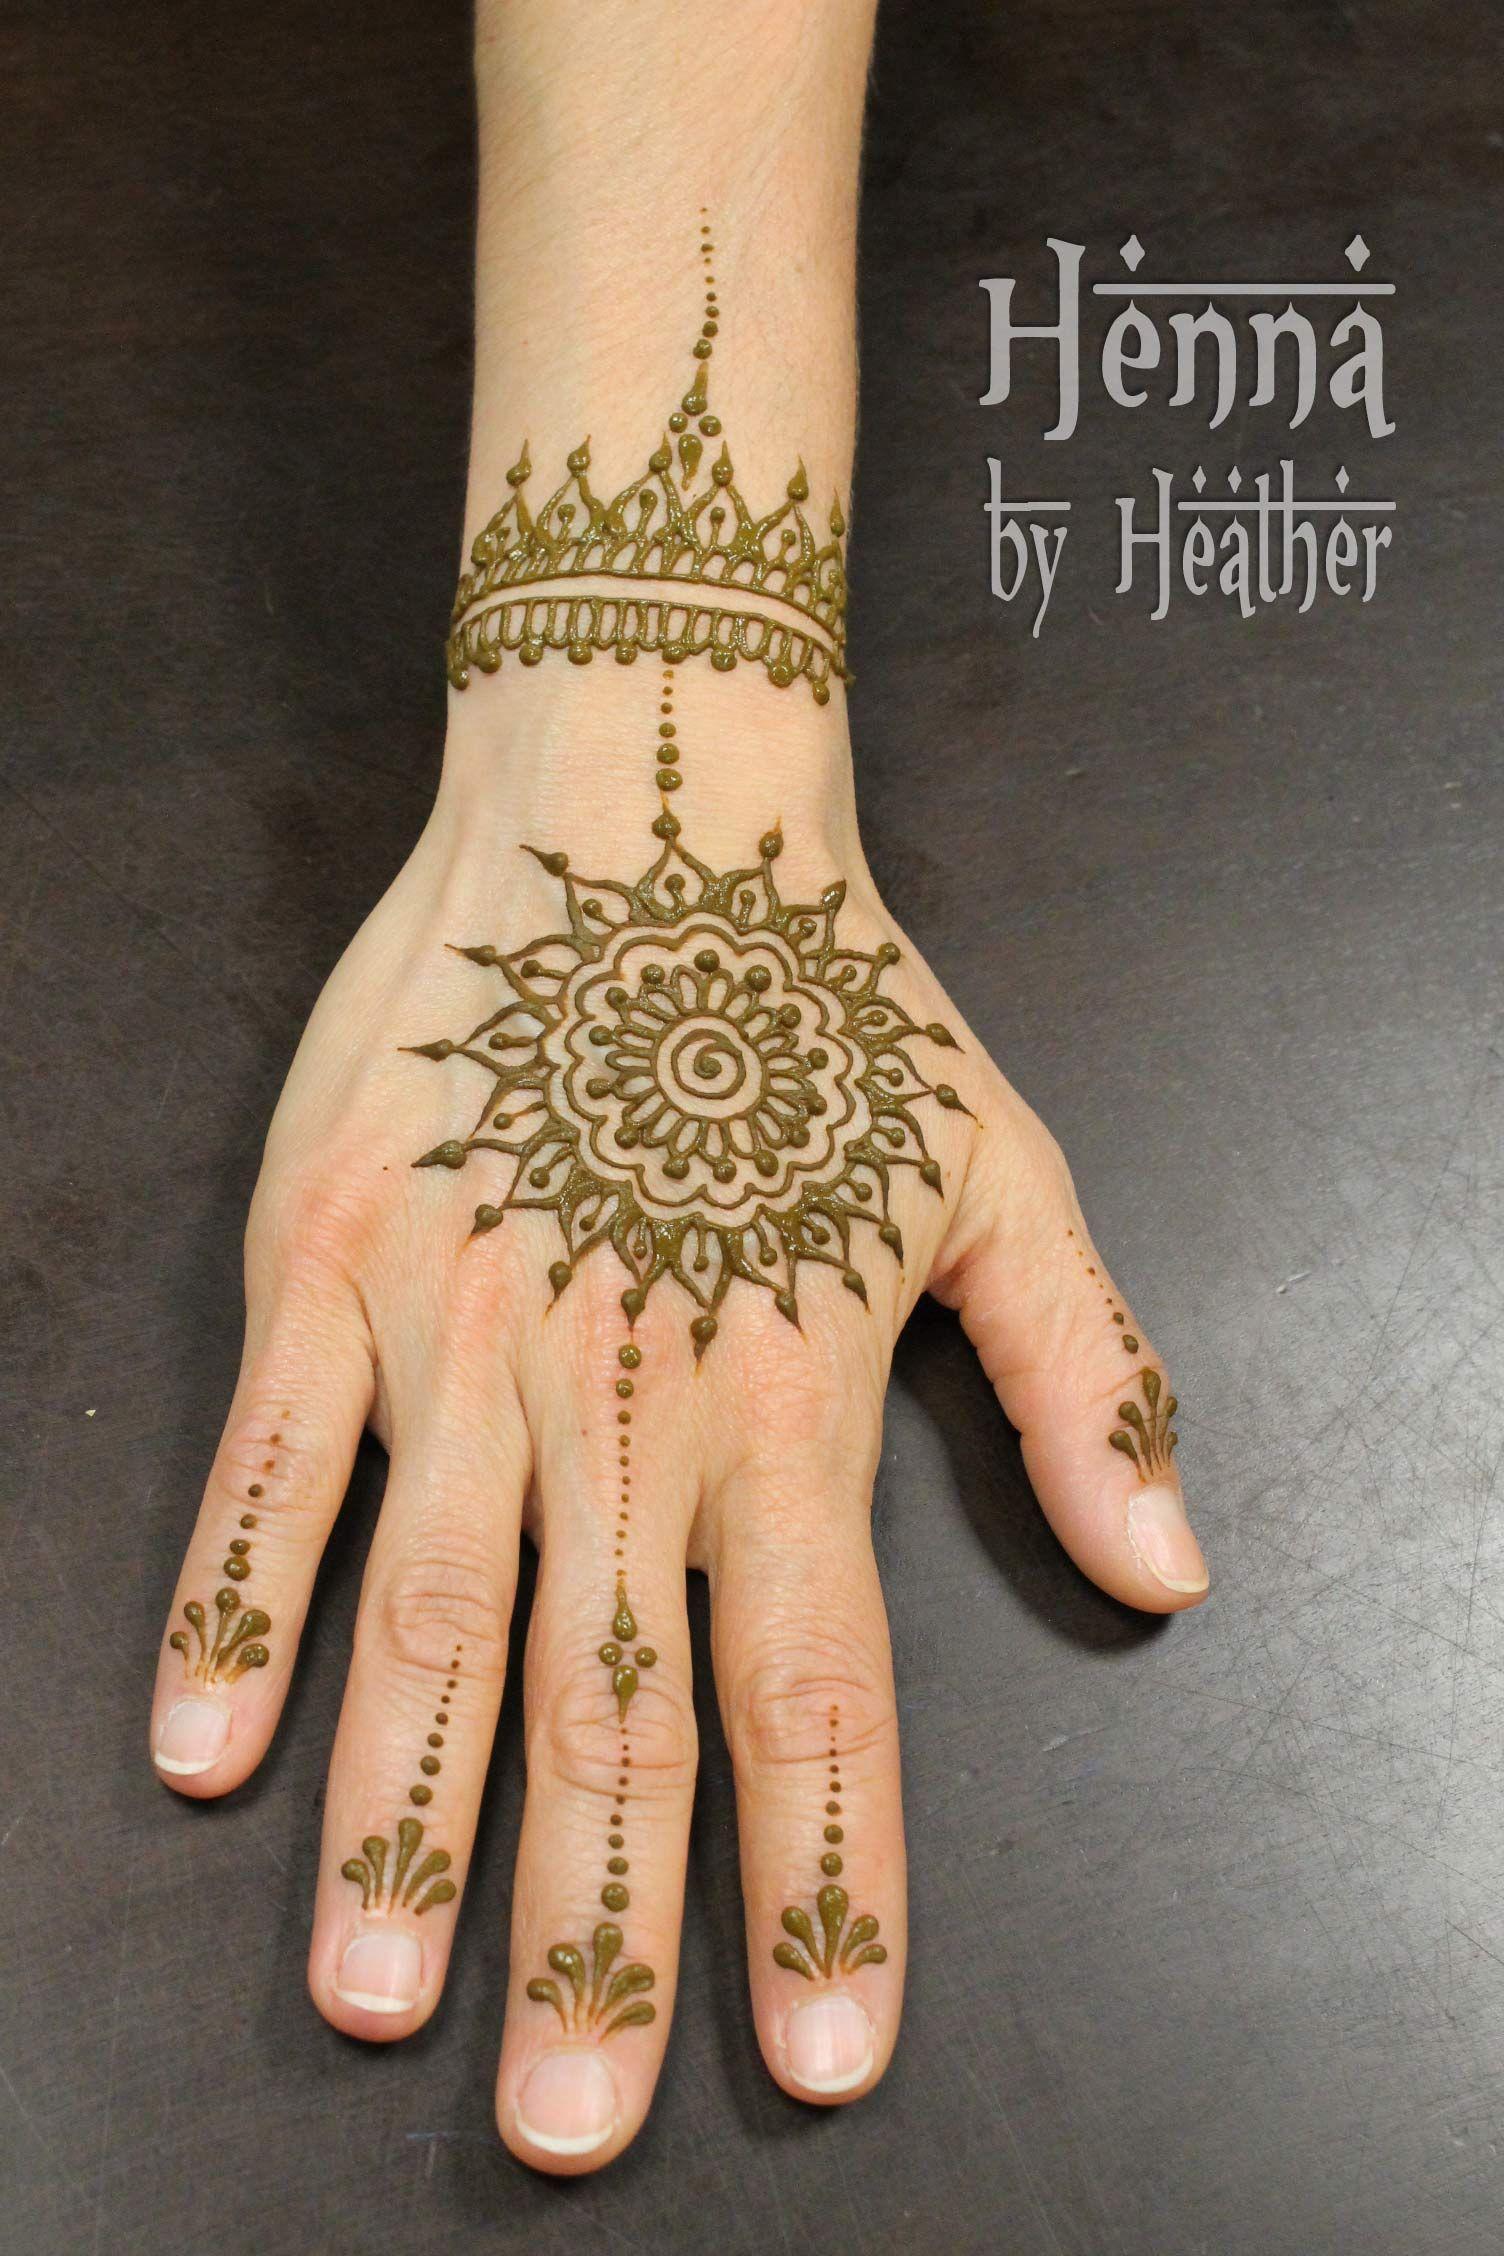 Traditional Henna Tattoo Designs: Traditional Henna Mandala Patterns - Google Search